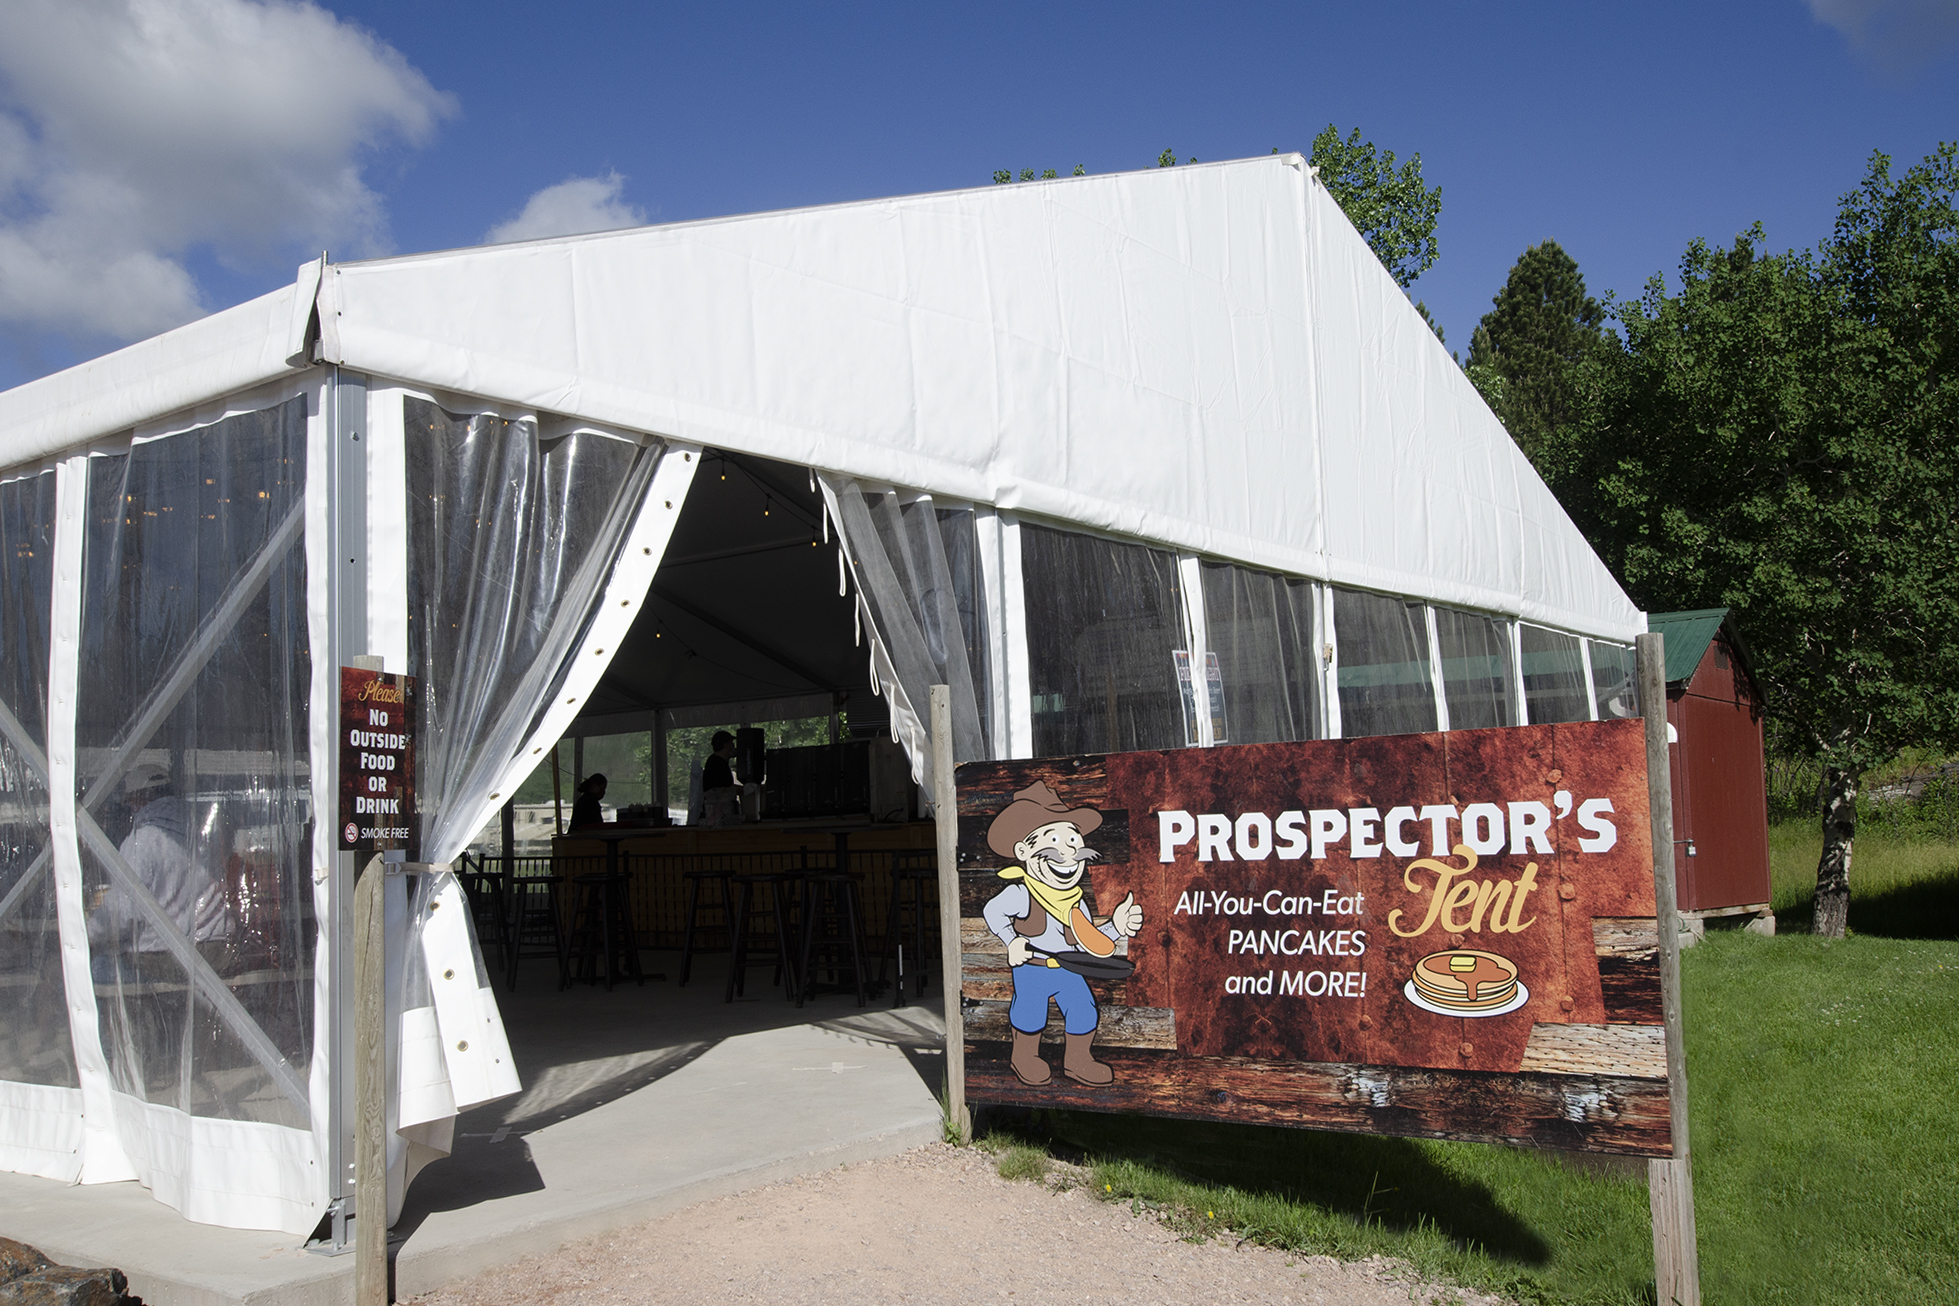 Mount Rushmore KOA Prospector's Tent All You Can Eat Pancake Breakfast